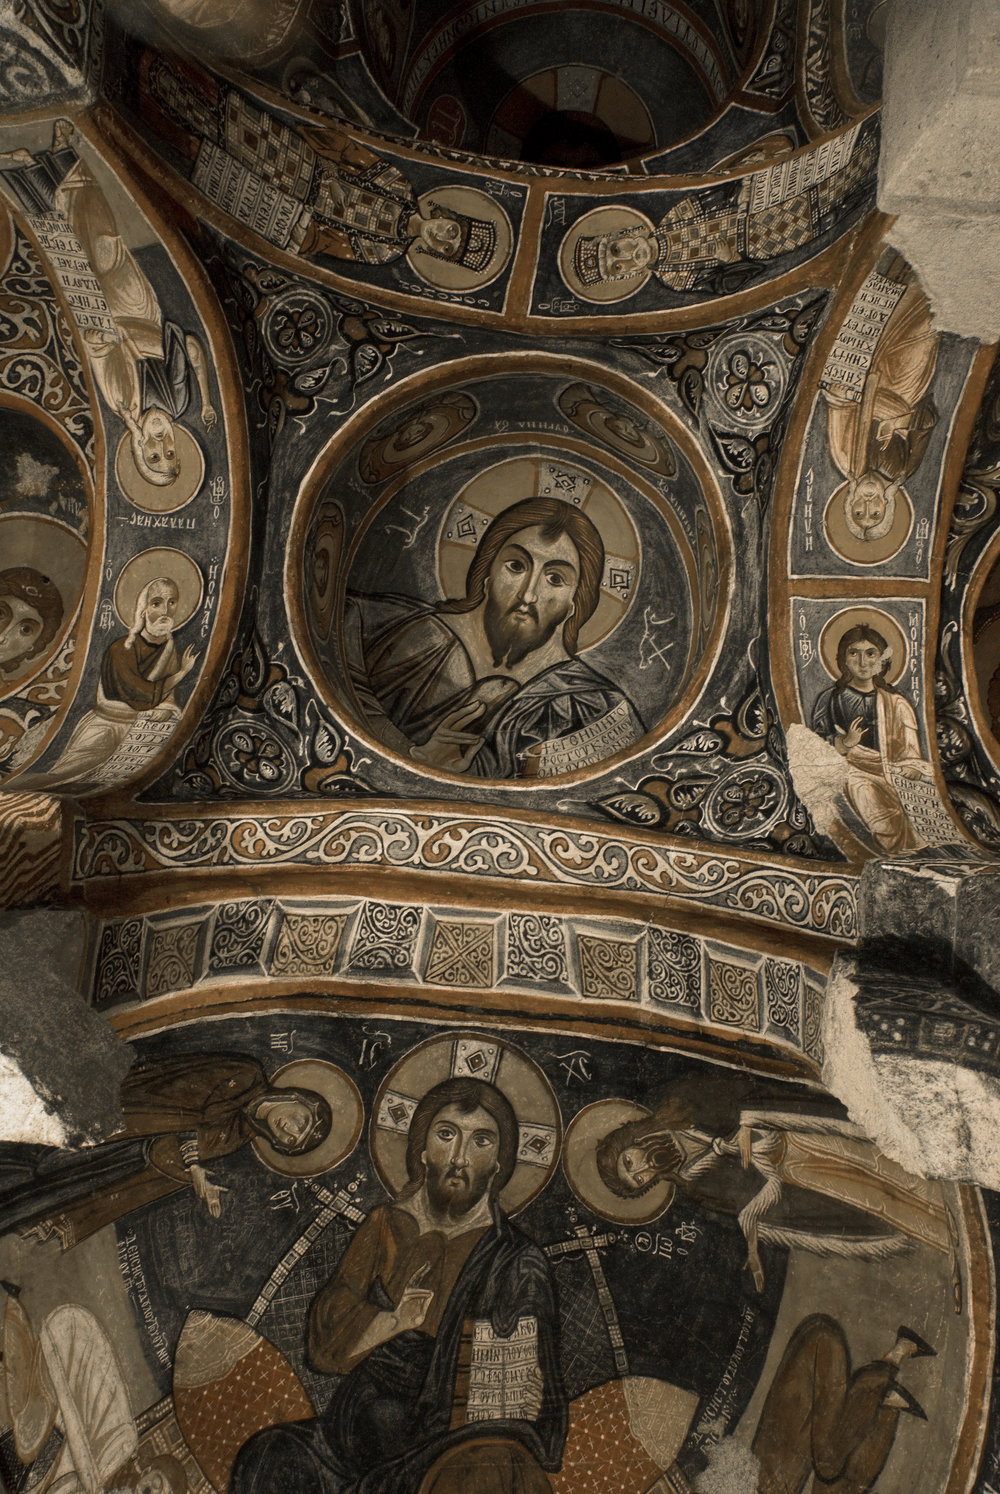 cappadocia126.jpg